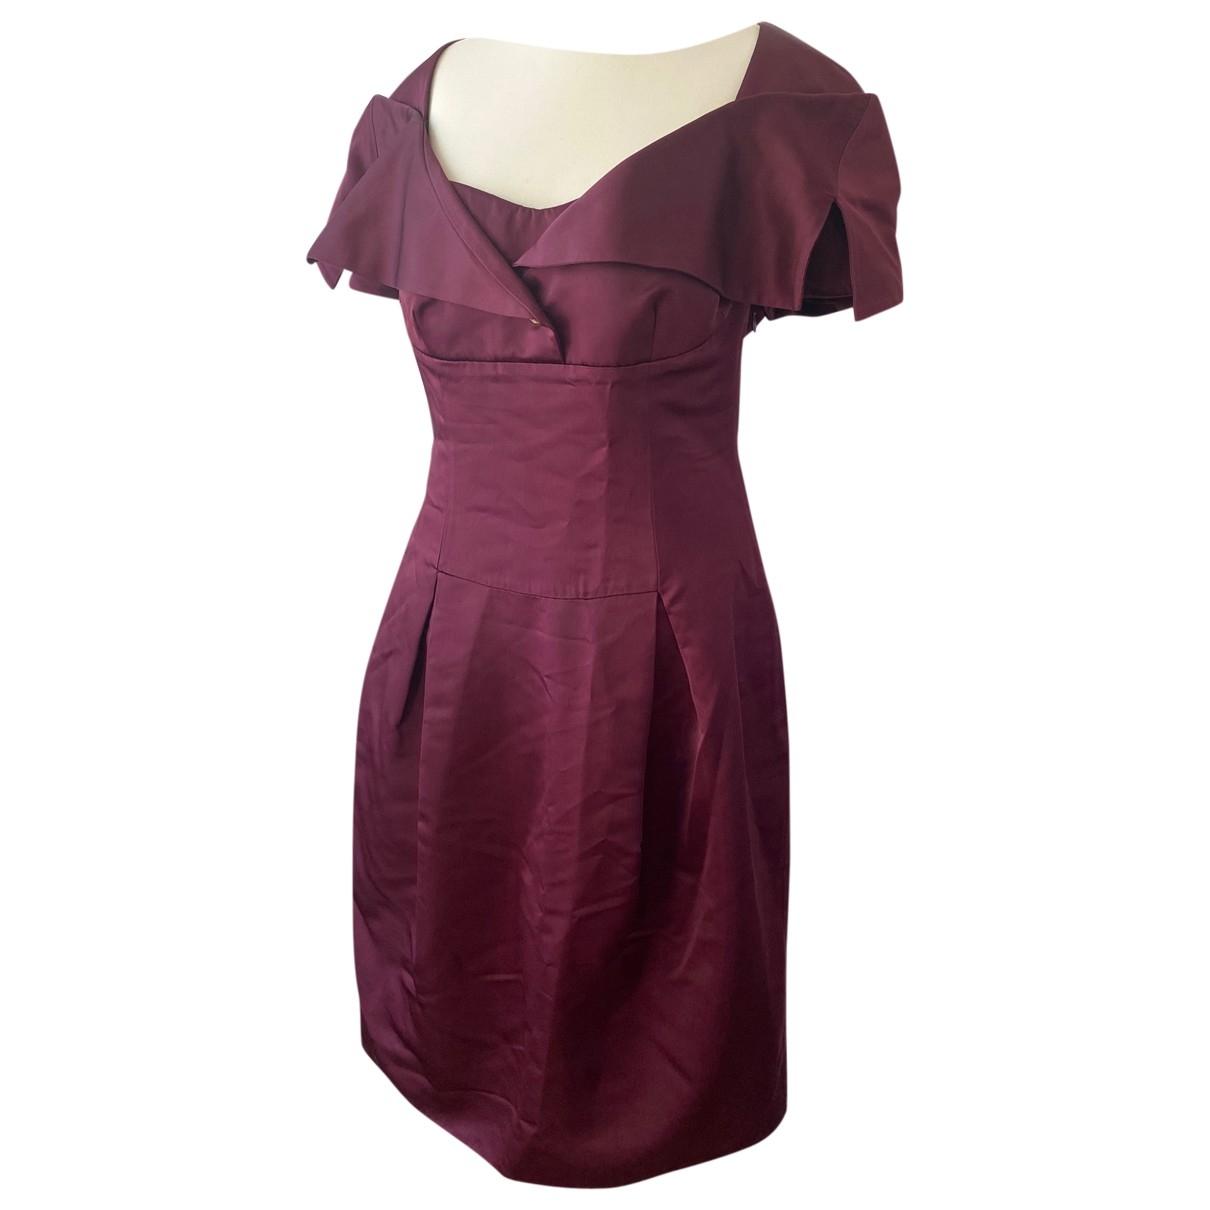 Vivienne Westwood Red Label \N Burgundy Silk dress for Women 46 FR